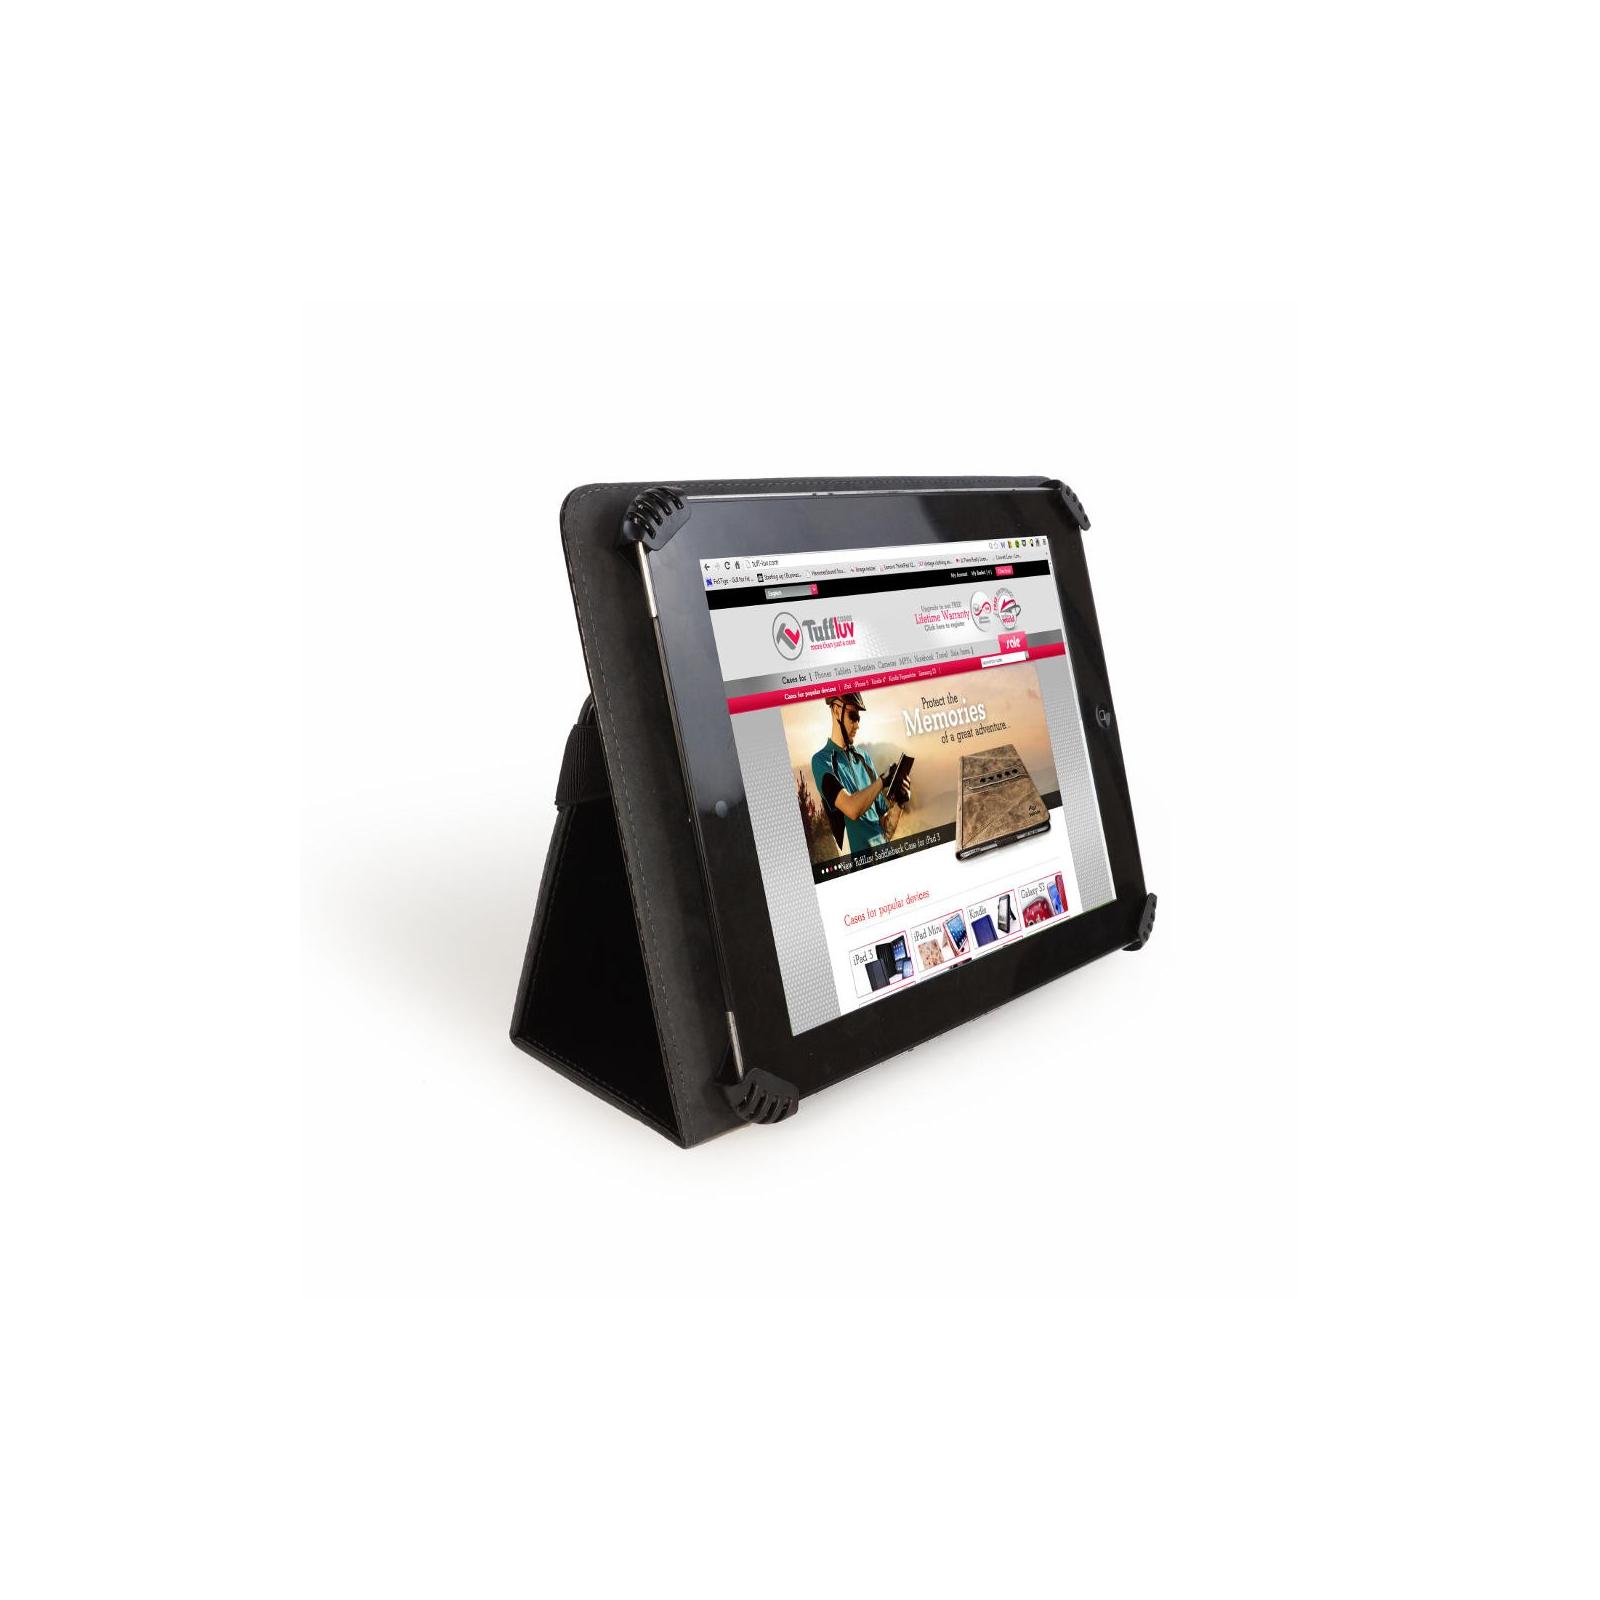 Чехол для планшета Tuff-Luv 10 Uni-View Black Carbon (A3_45) изображение 4